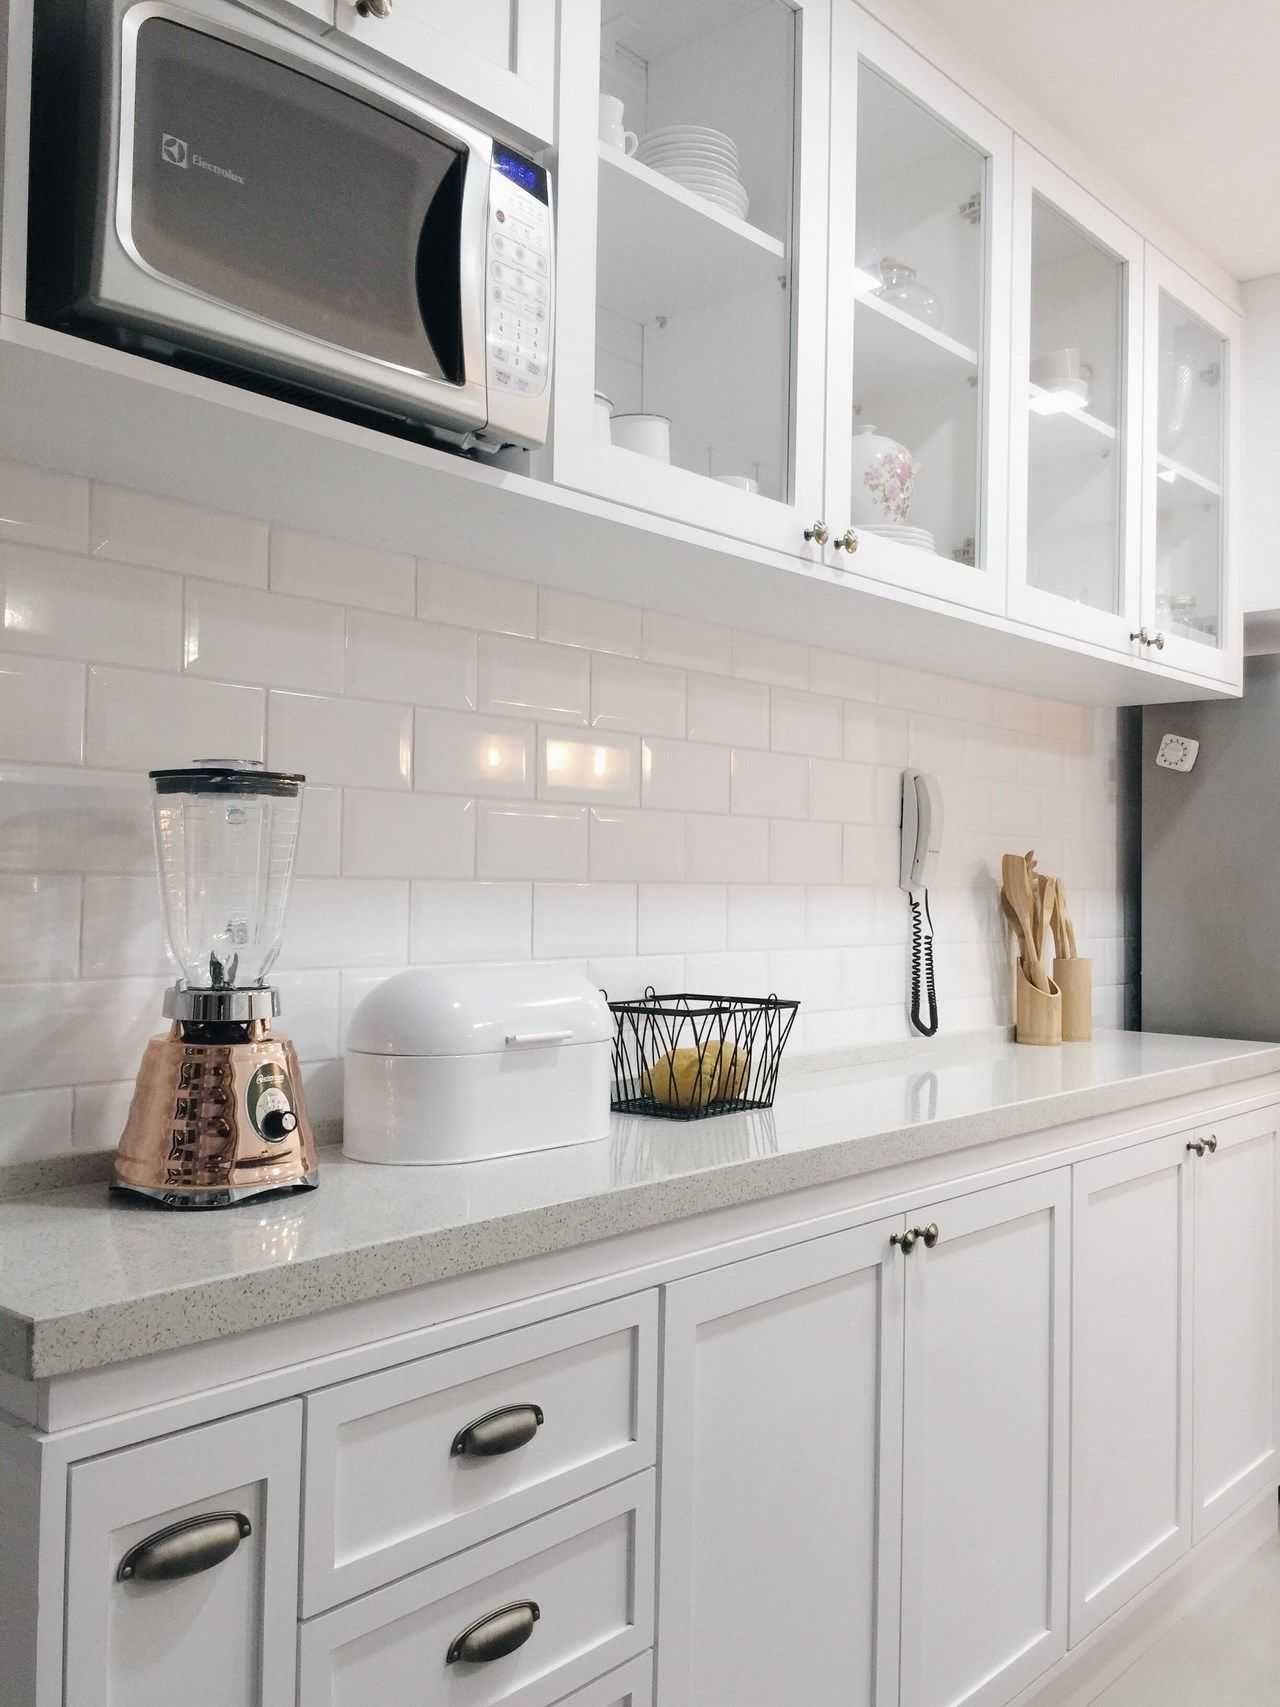 30 Amazing Design Ideas For A Kitchen Backsplash: Scandinavian Kitchen Backsplash